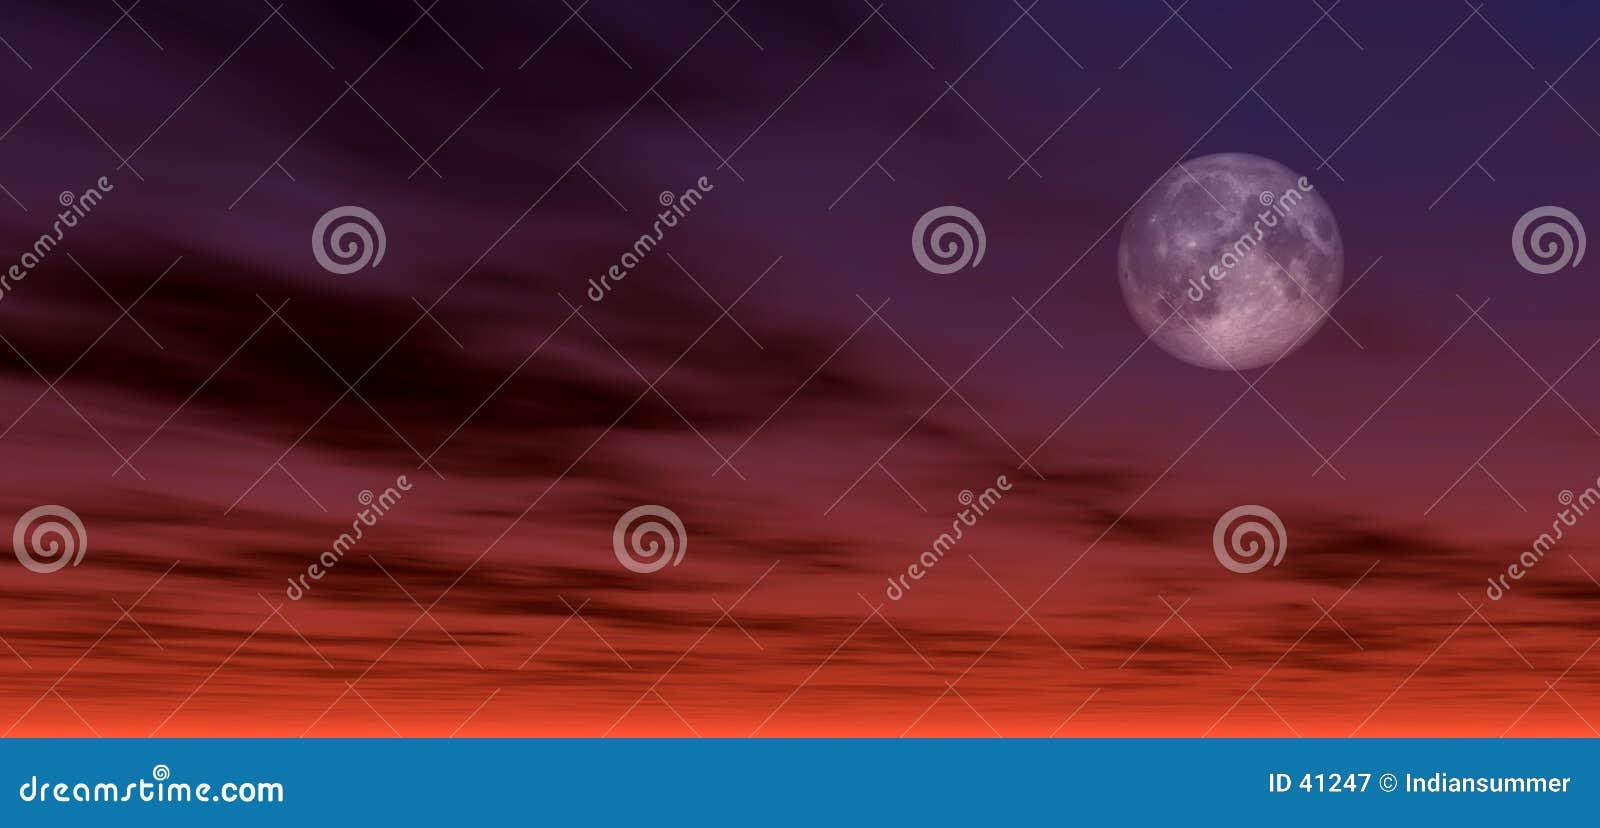 Moonlight background 2